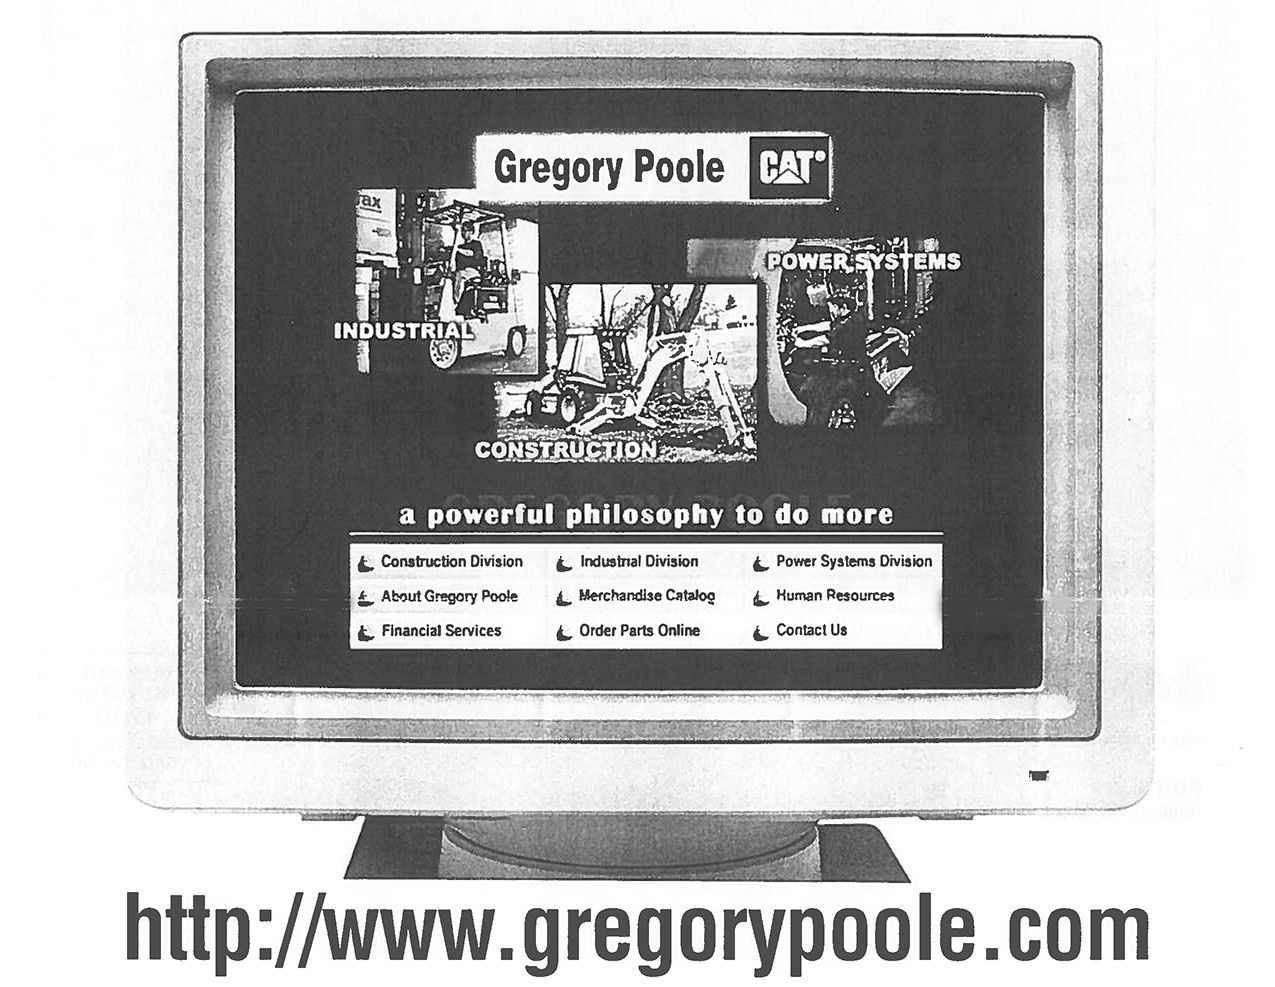 Originalwebsite Gregory Poole